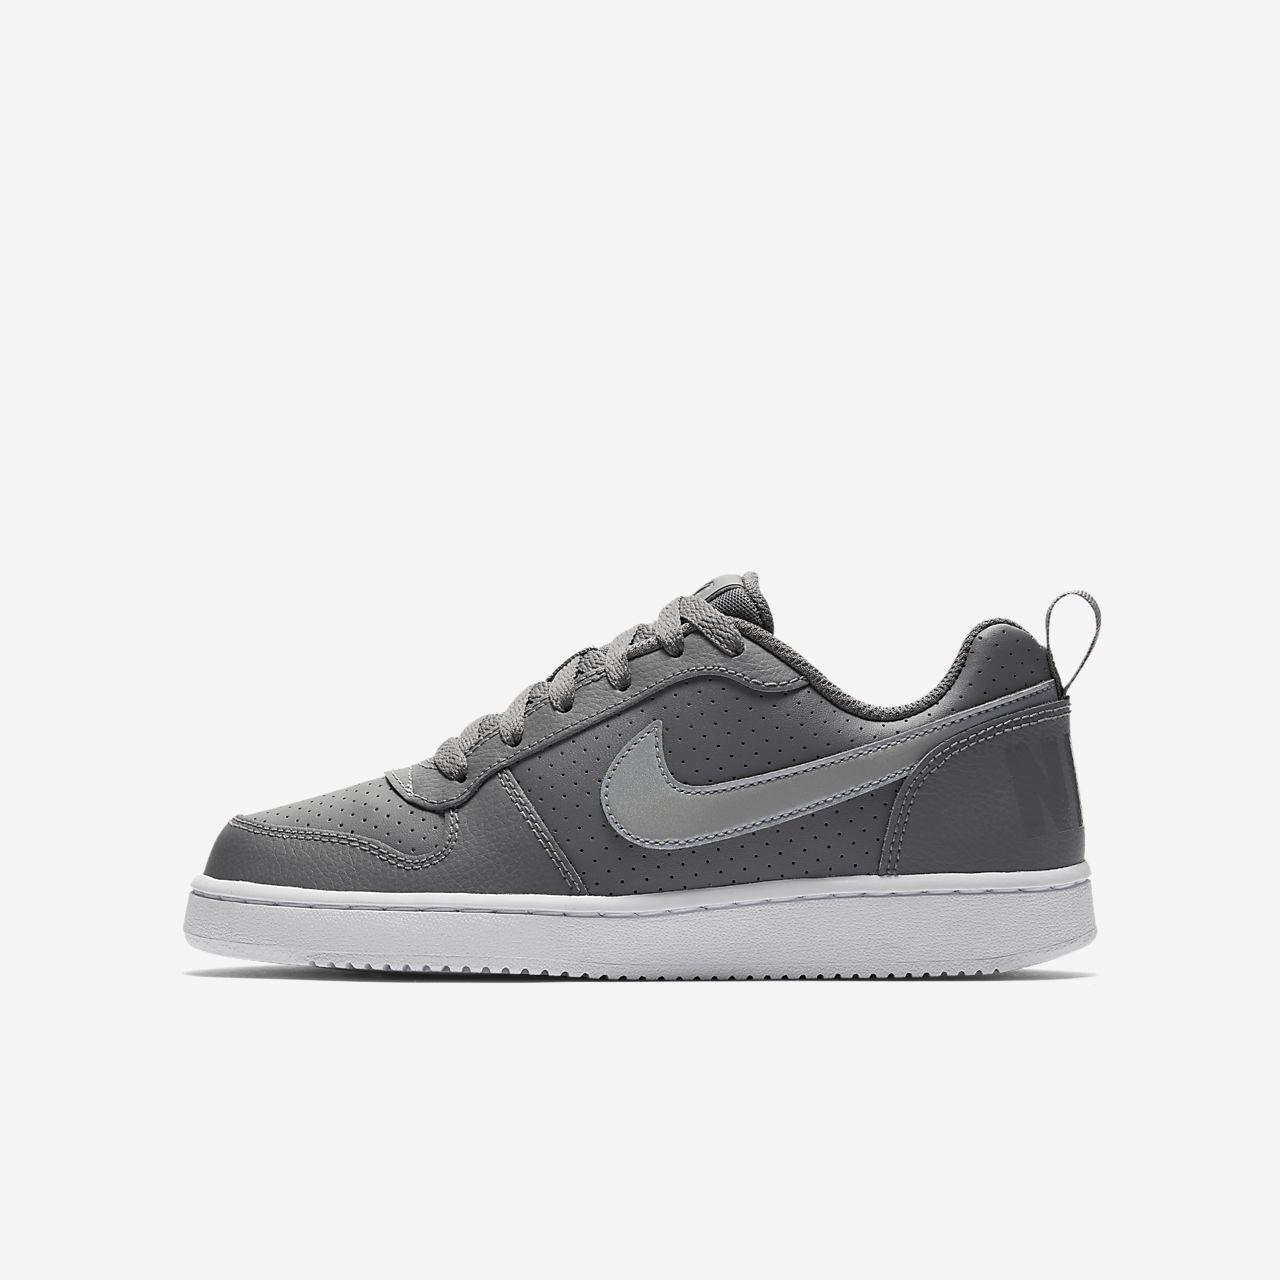 5cfa827d5a NikeCourt Borough Low Older Kids  Shoe. Nike.com AU